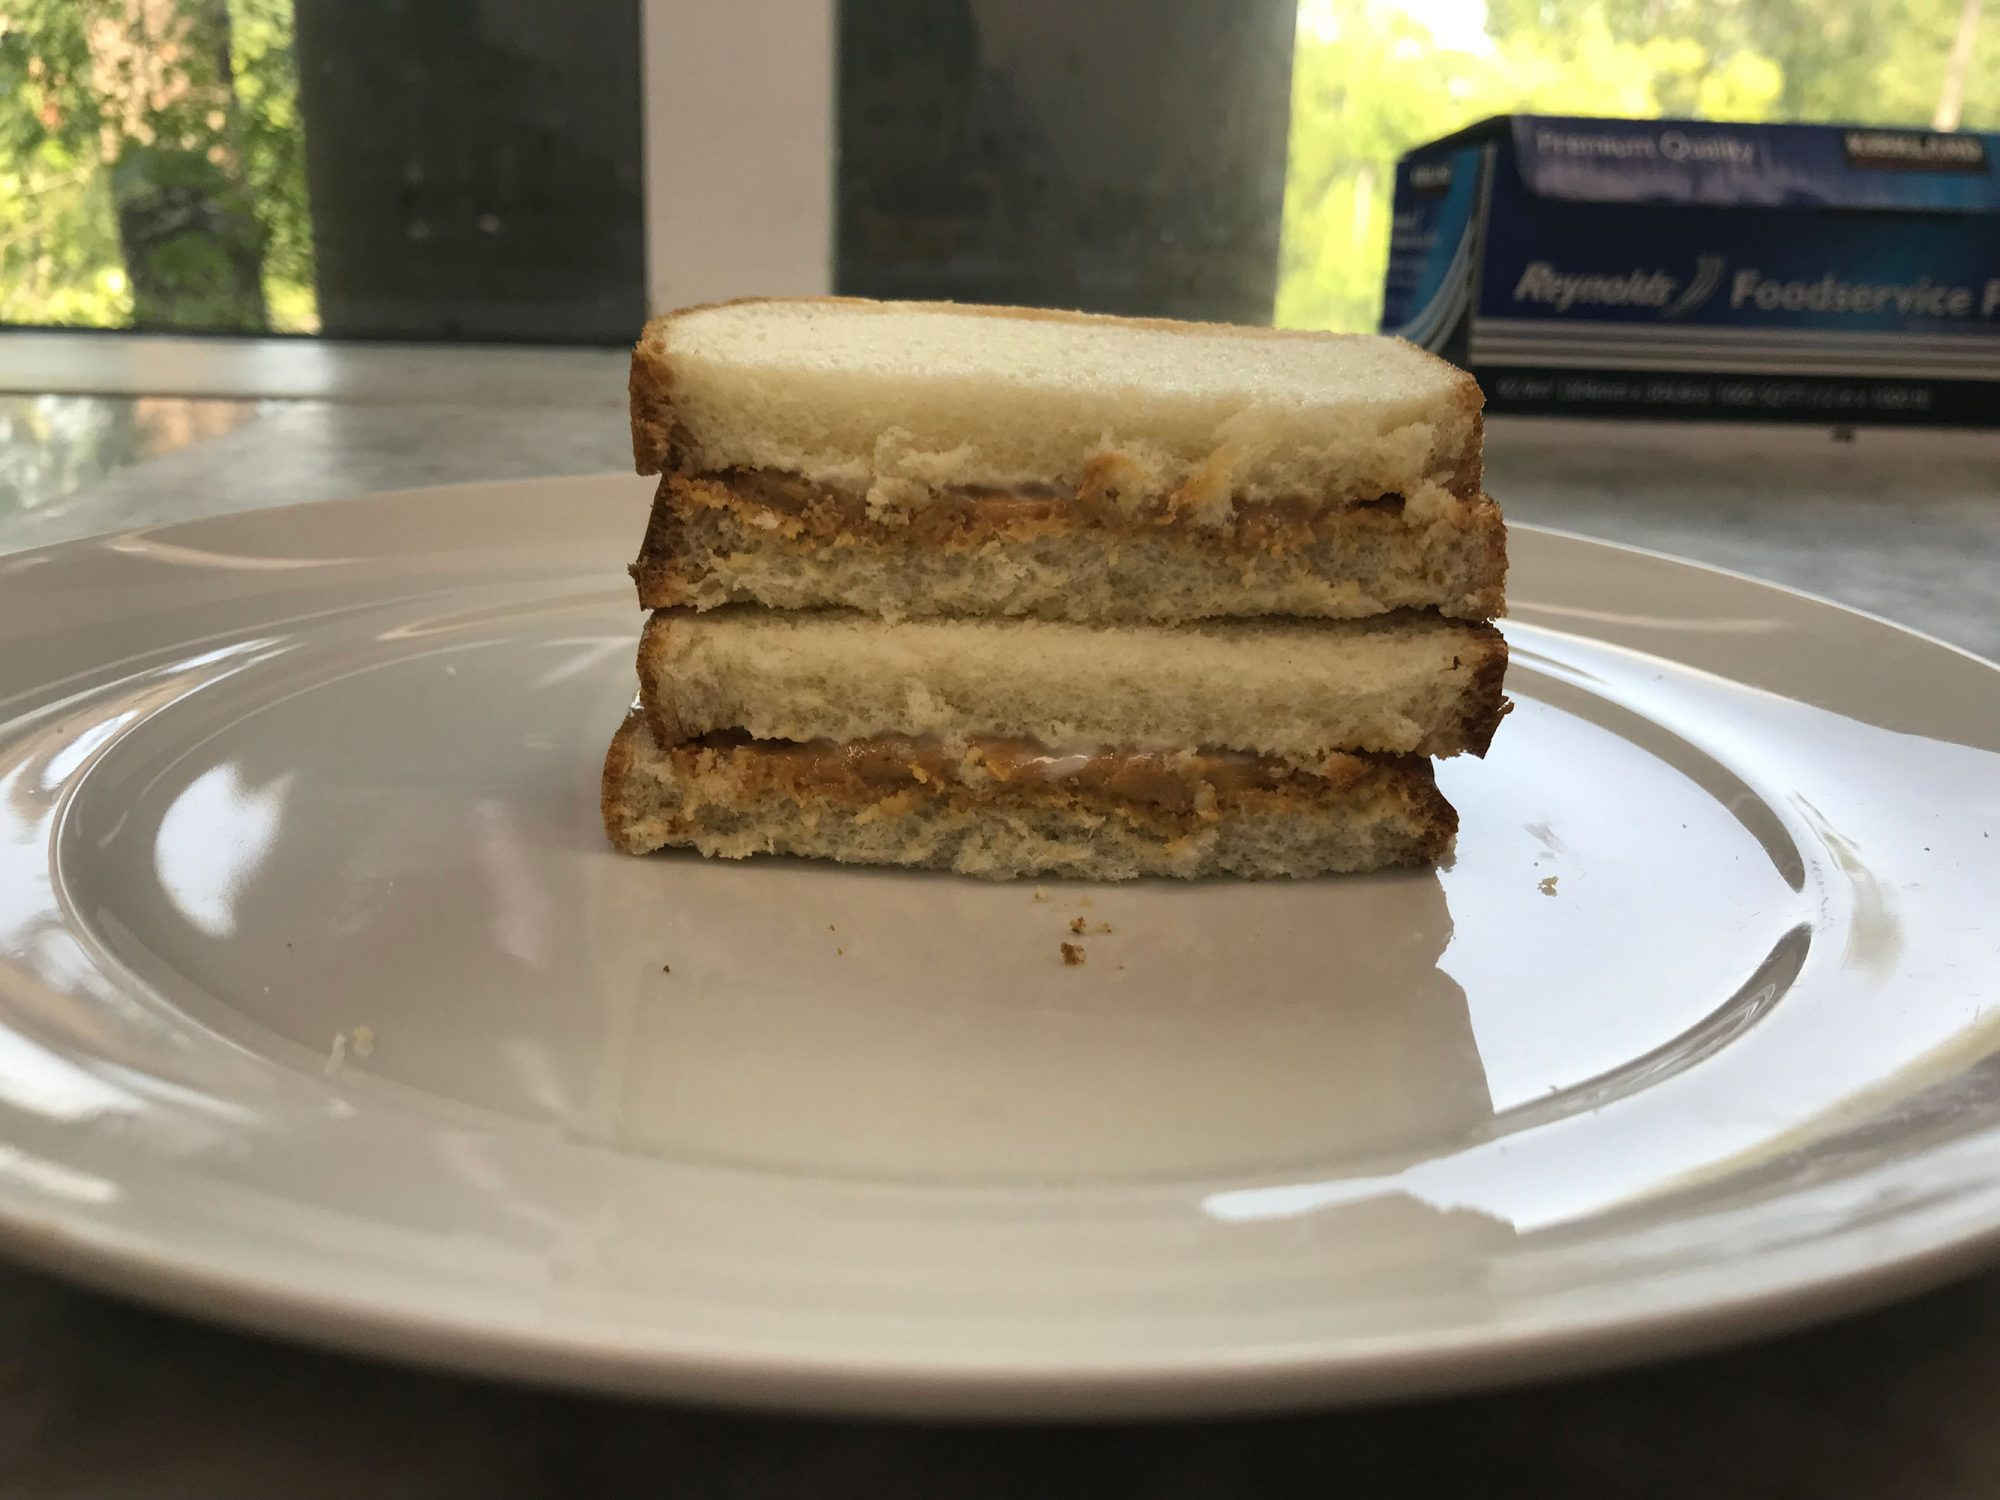 peanut butter and mayonnaise sandwich